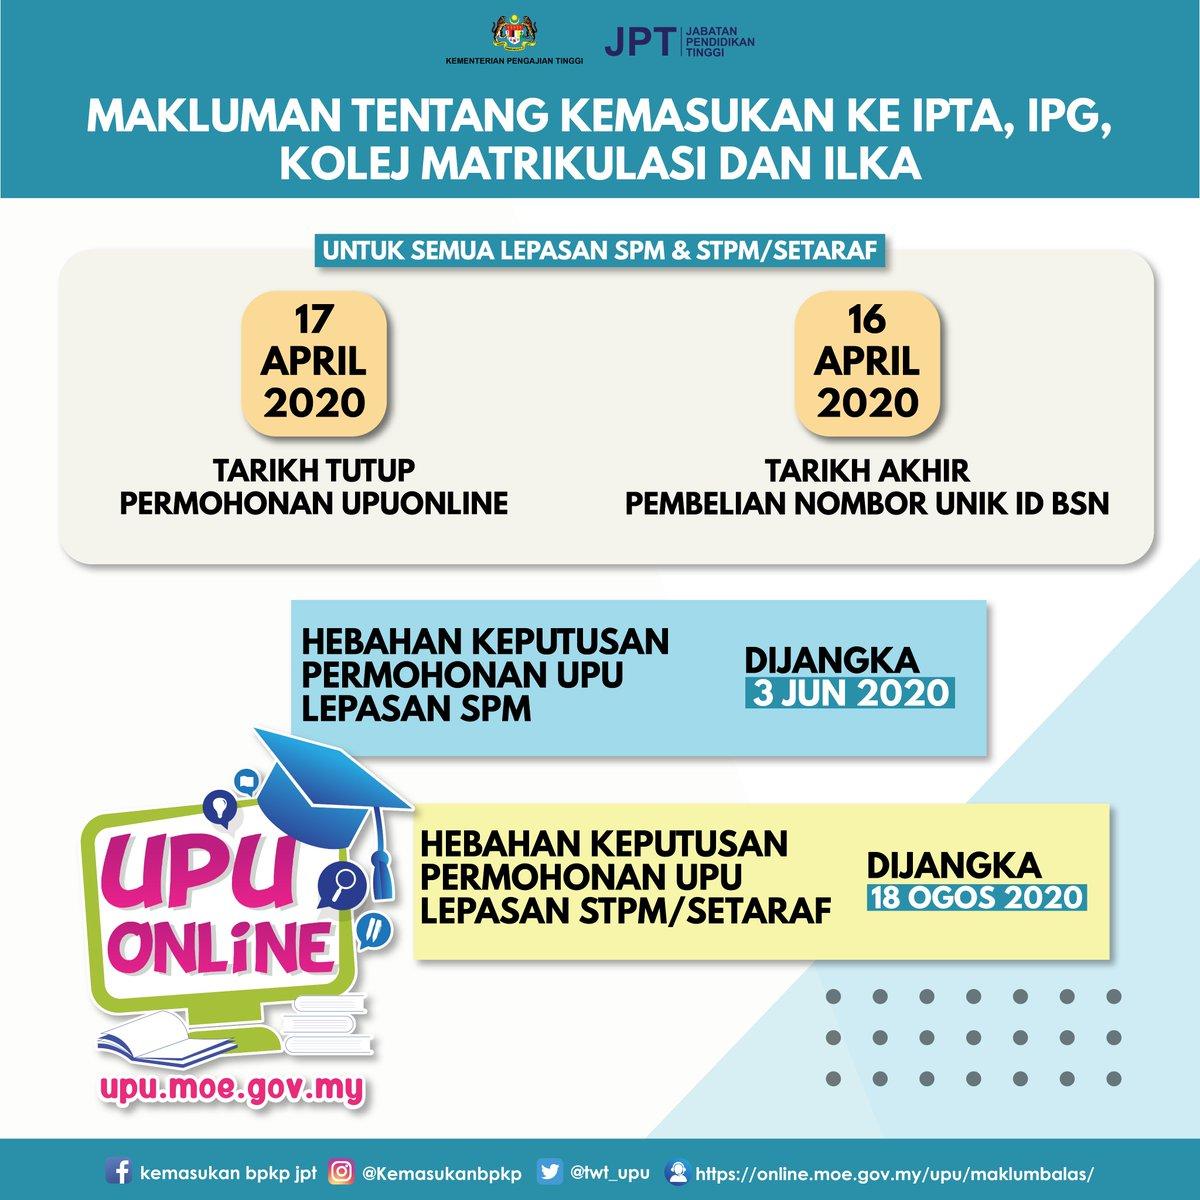 Semakan Keputusan Permohonan Upu Online Bagi Lepasan Spm Sesi Akademik 2020 2021